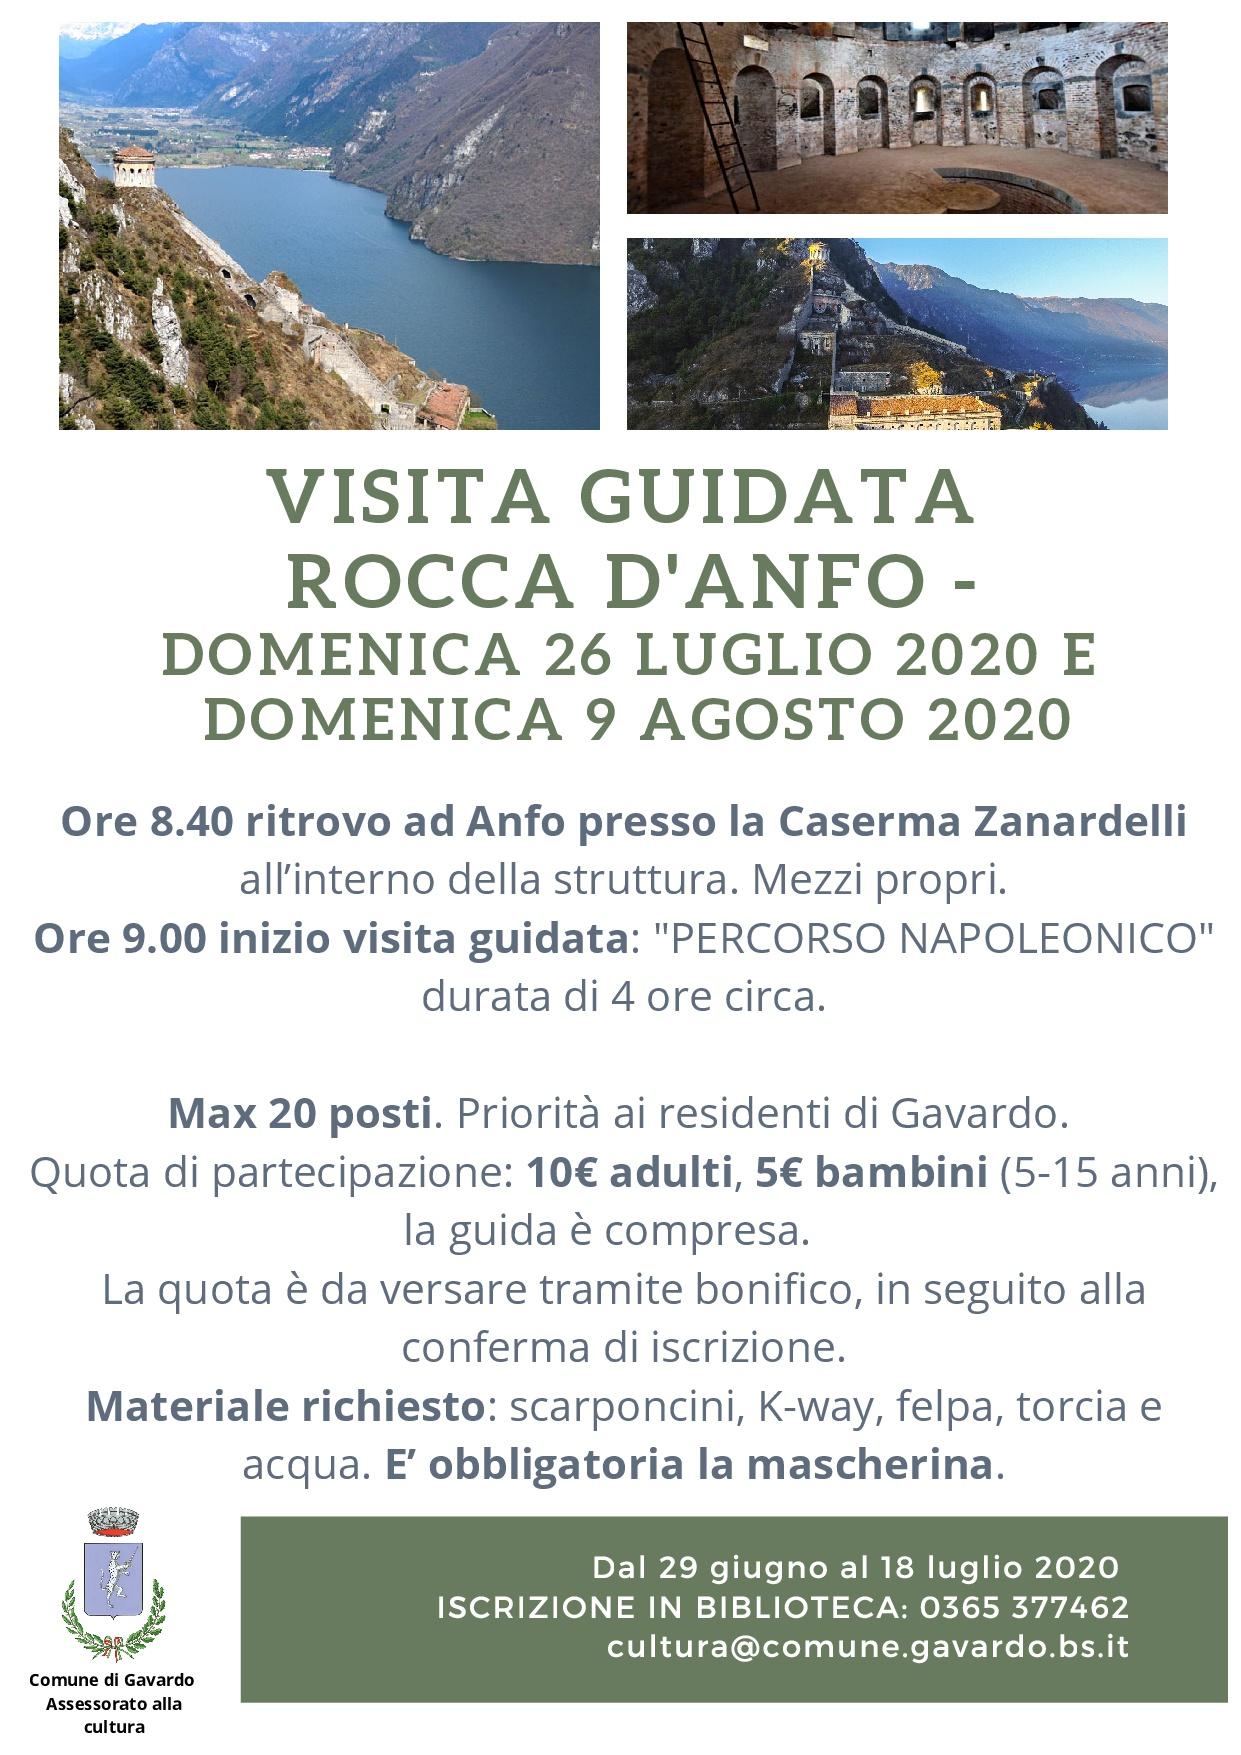 Visita guidata Rocca d'Anfo